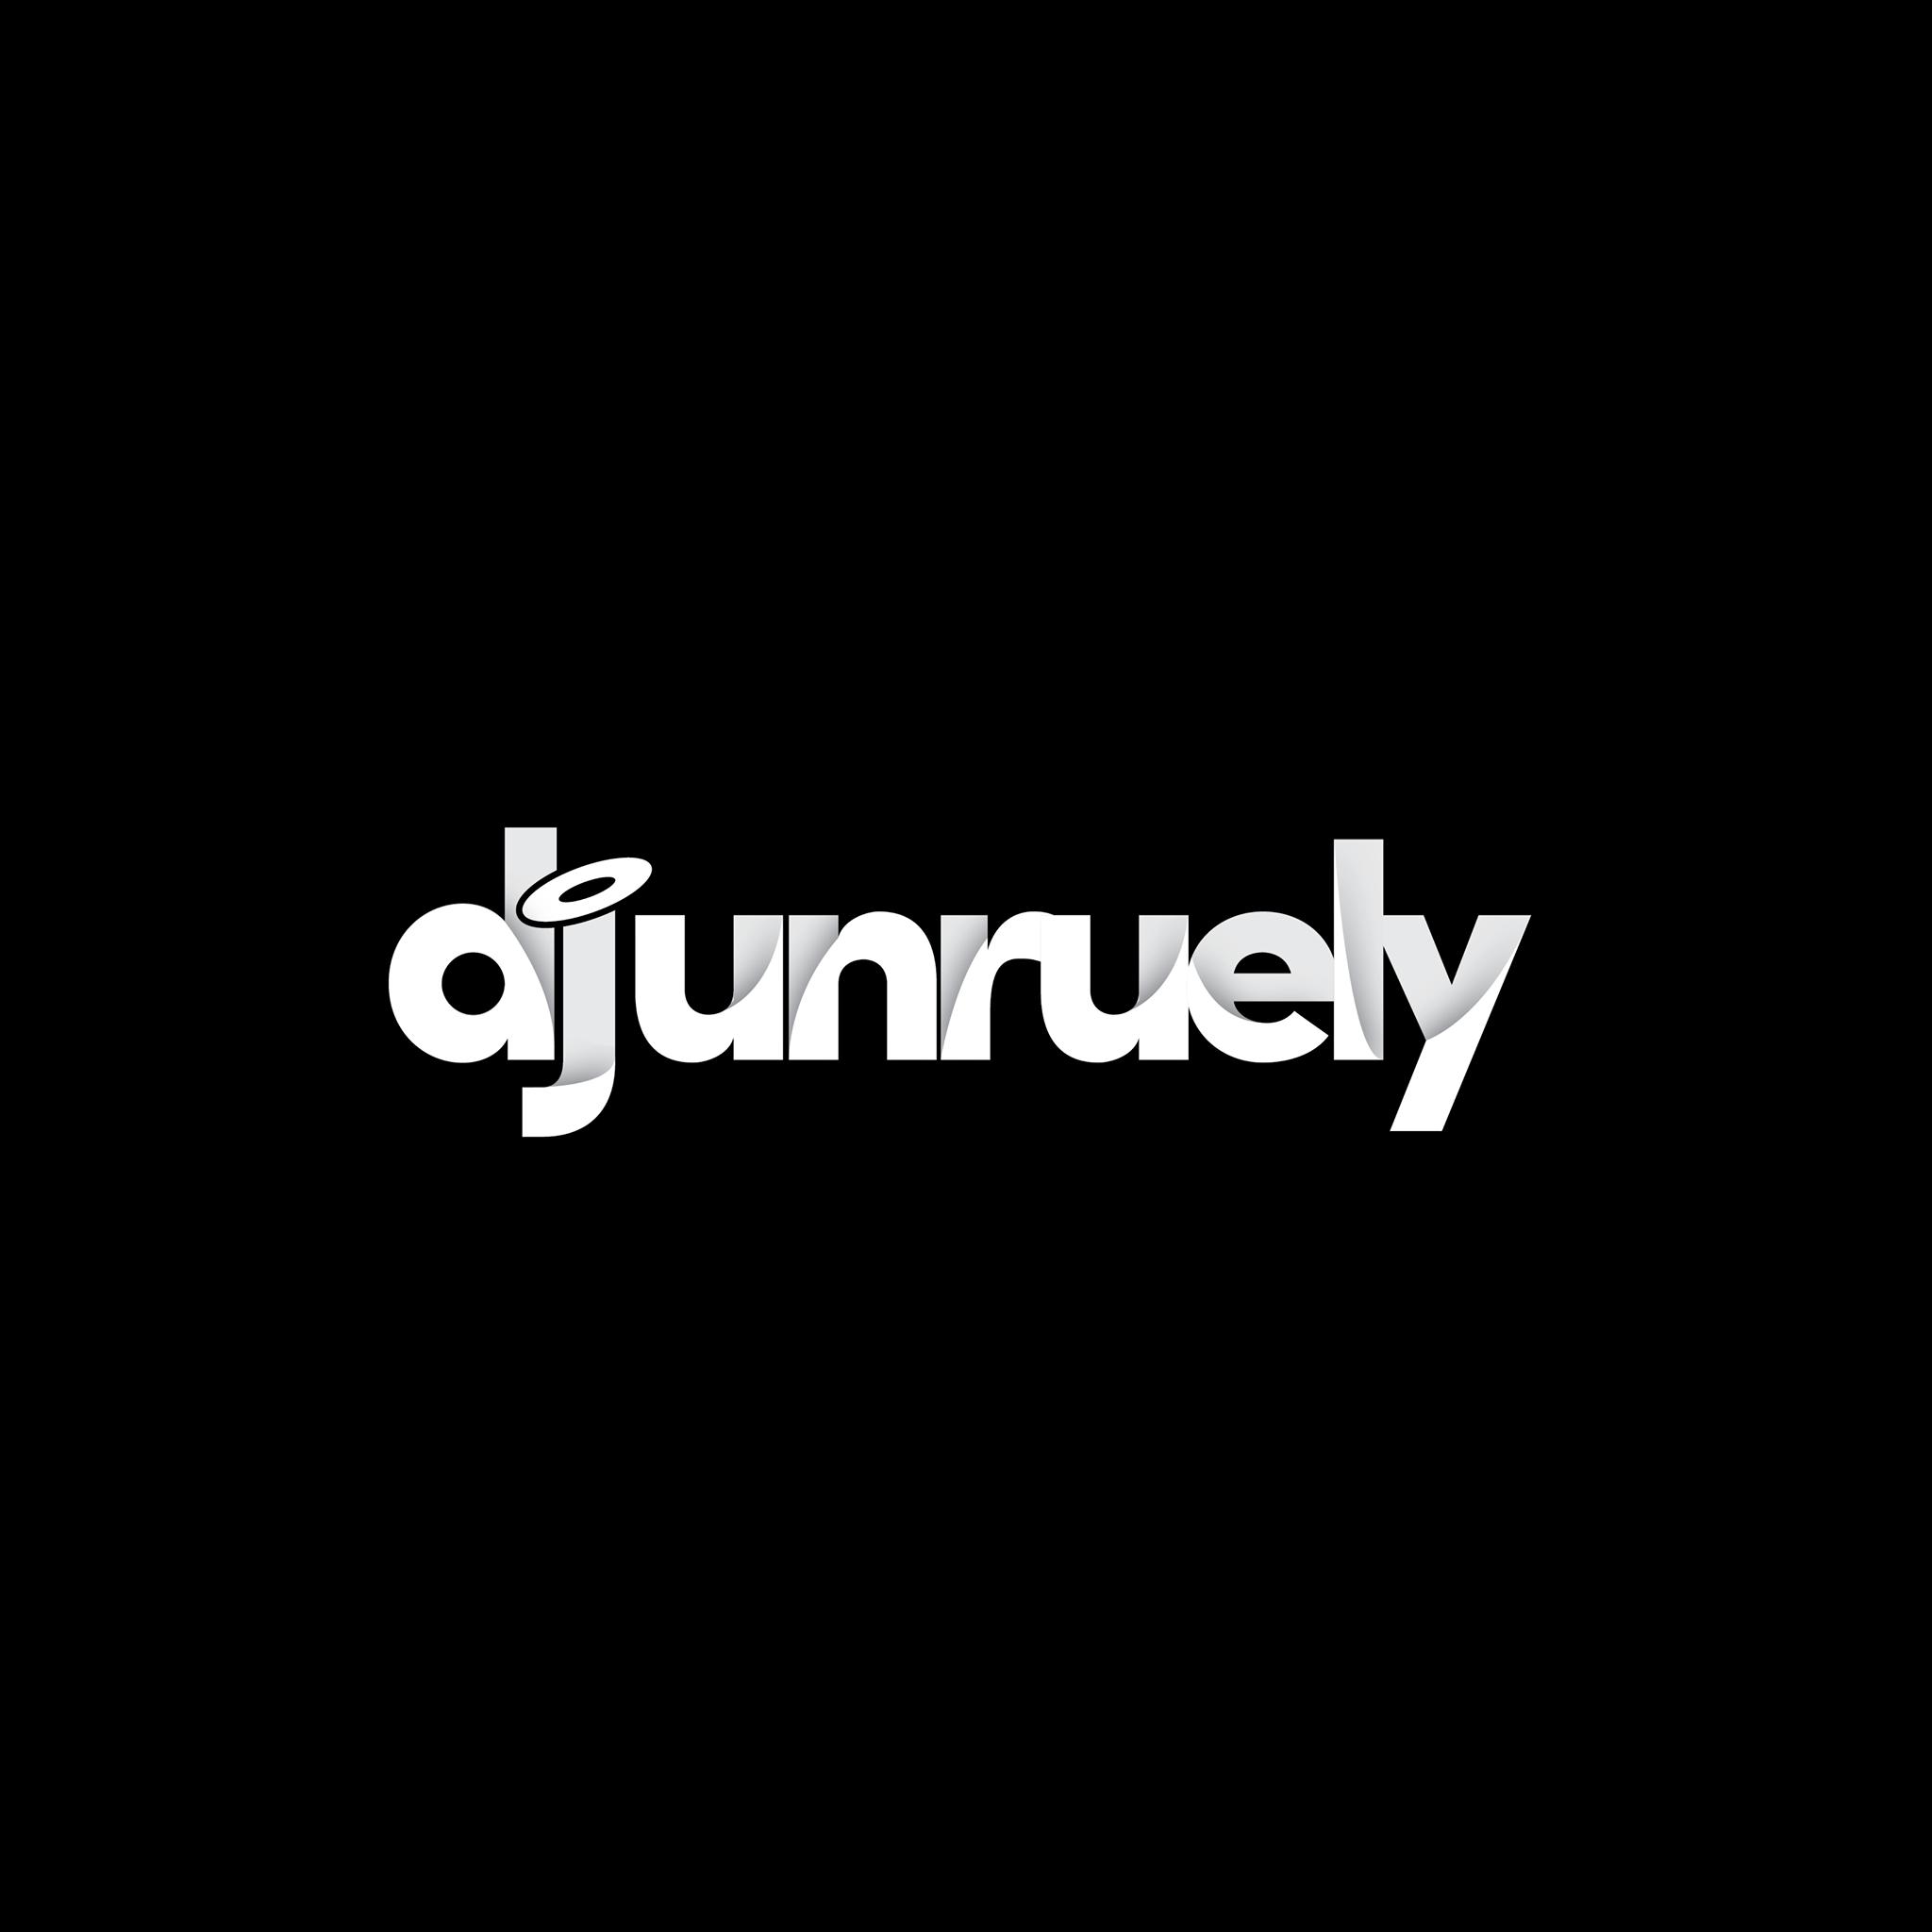 DJ Unruely - Black Owned